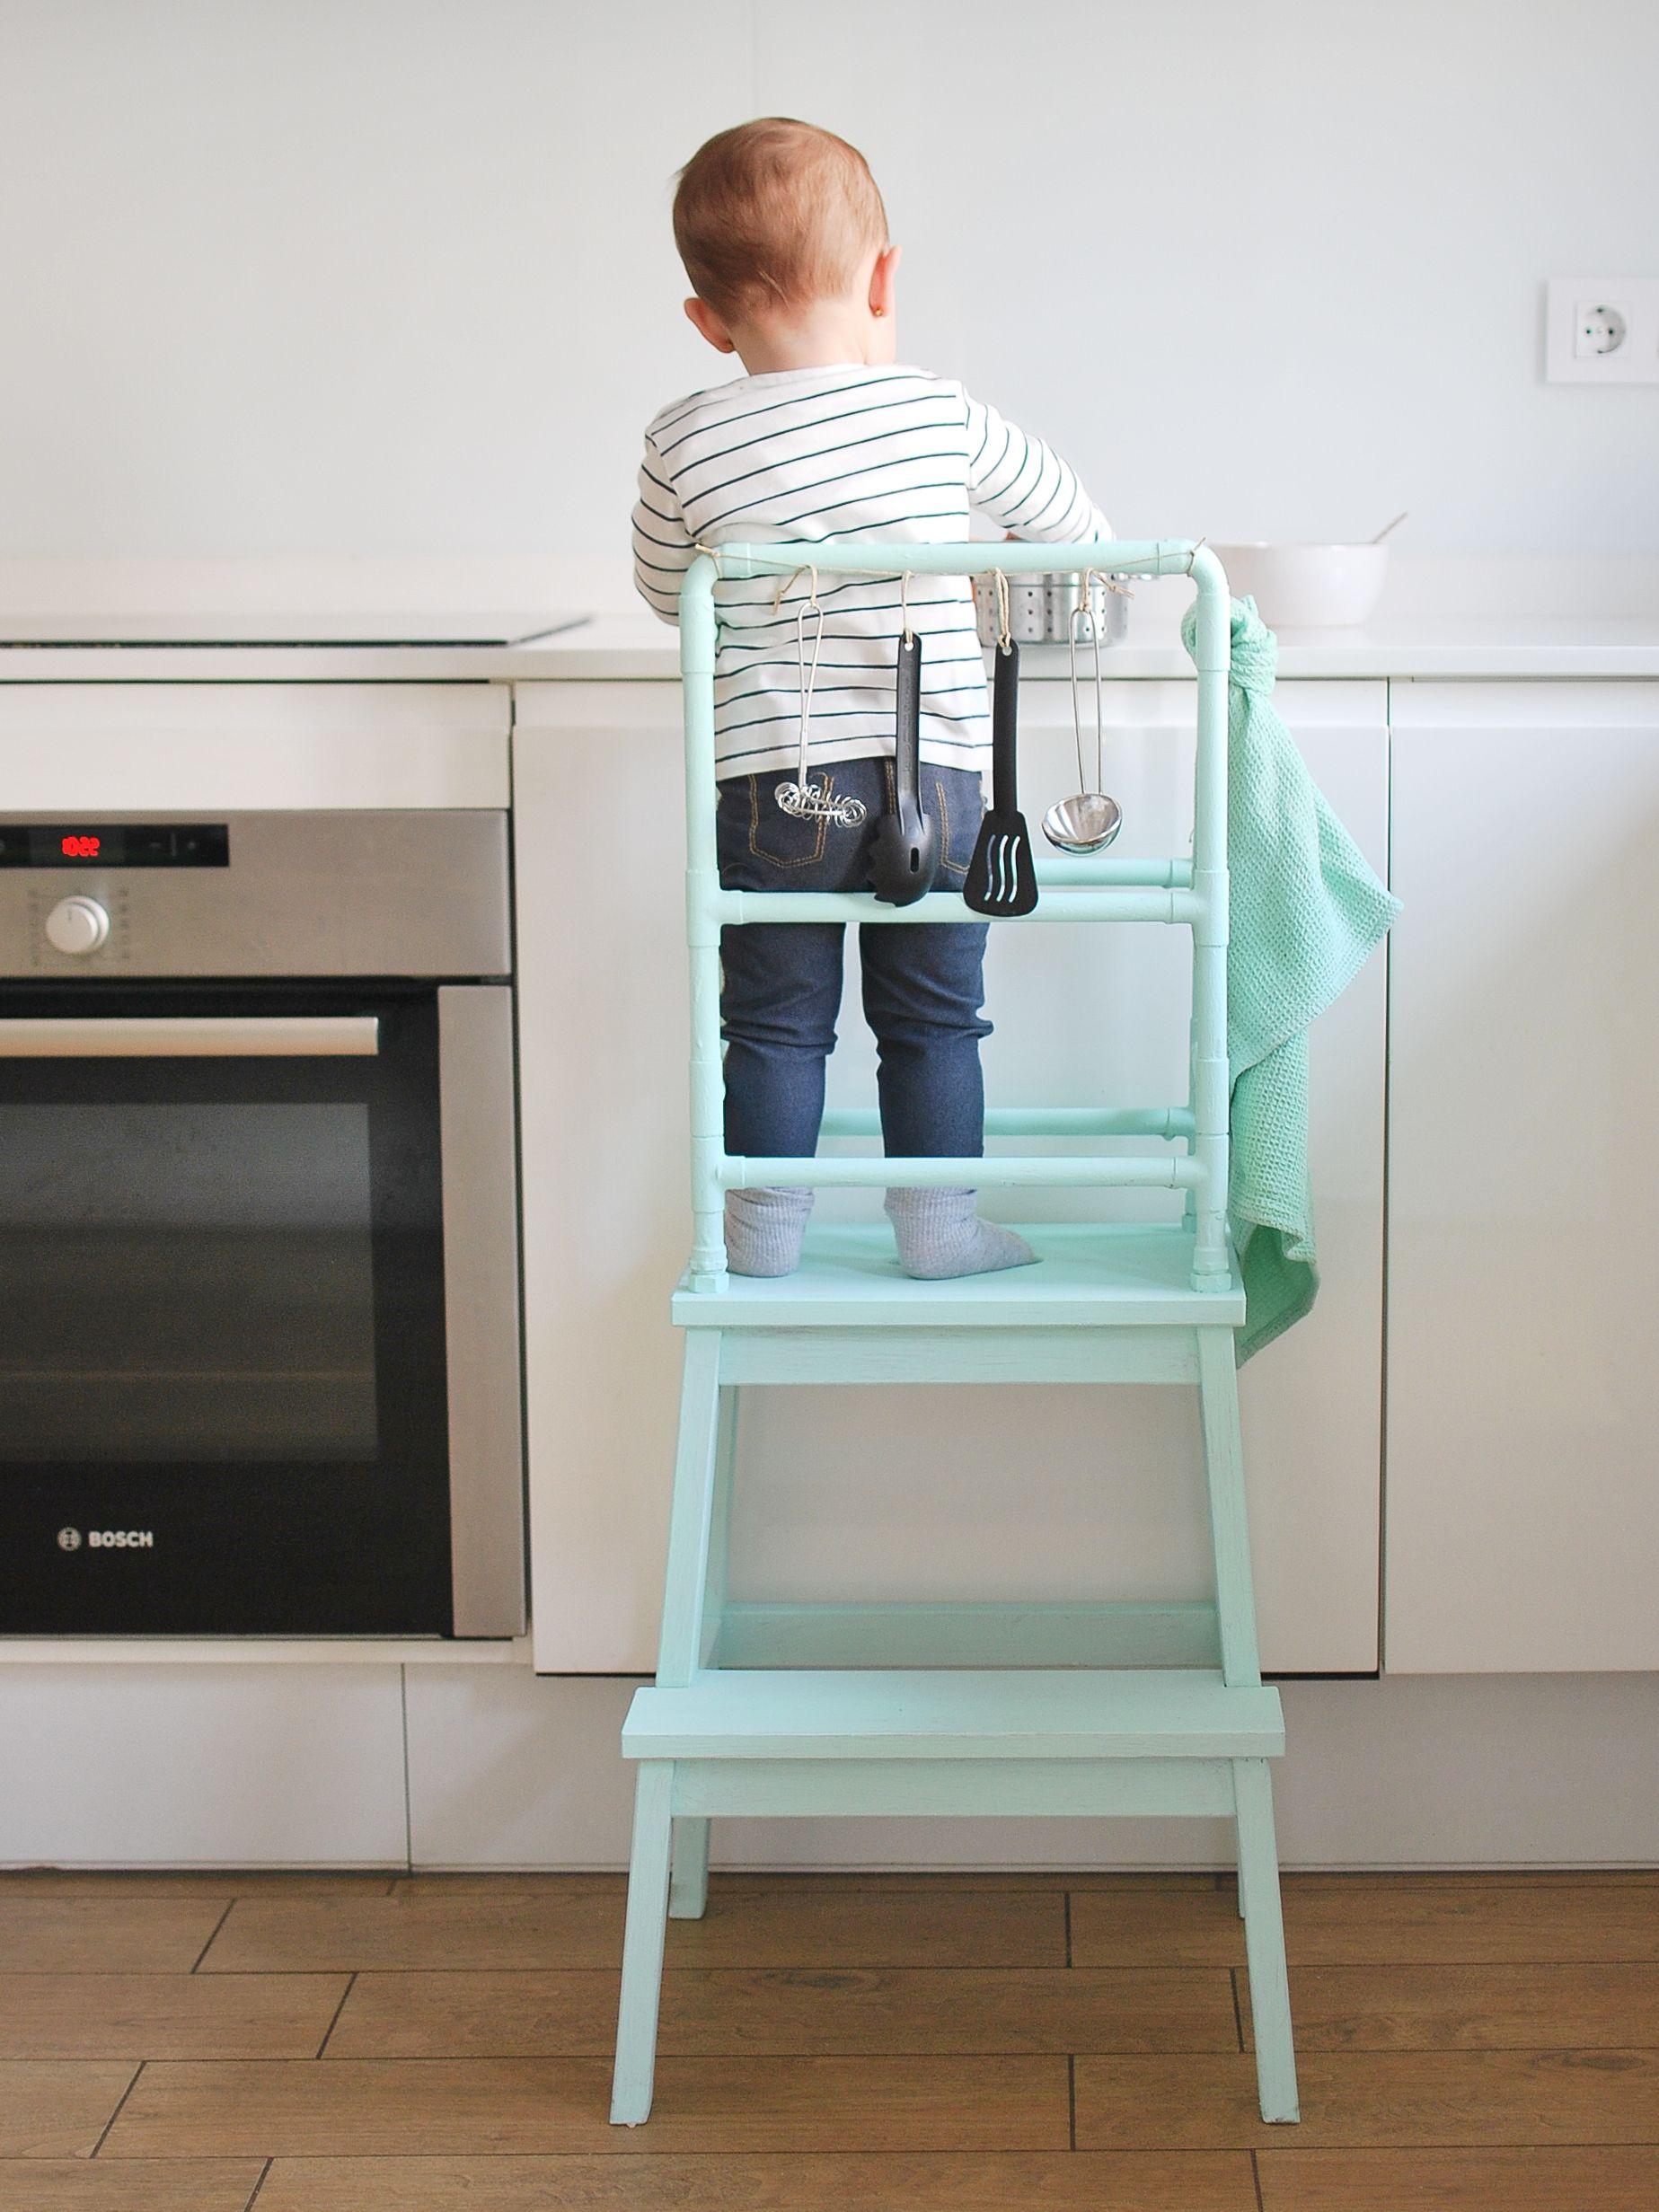 Torre de aprendizaje DIY: ideas Montessori | Montessori | Pinterest ...